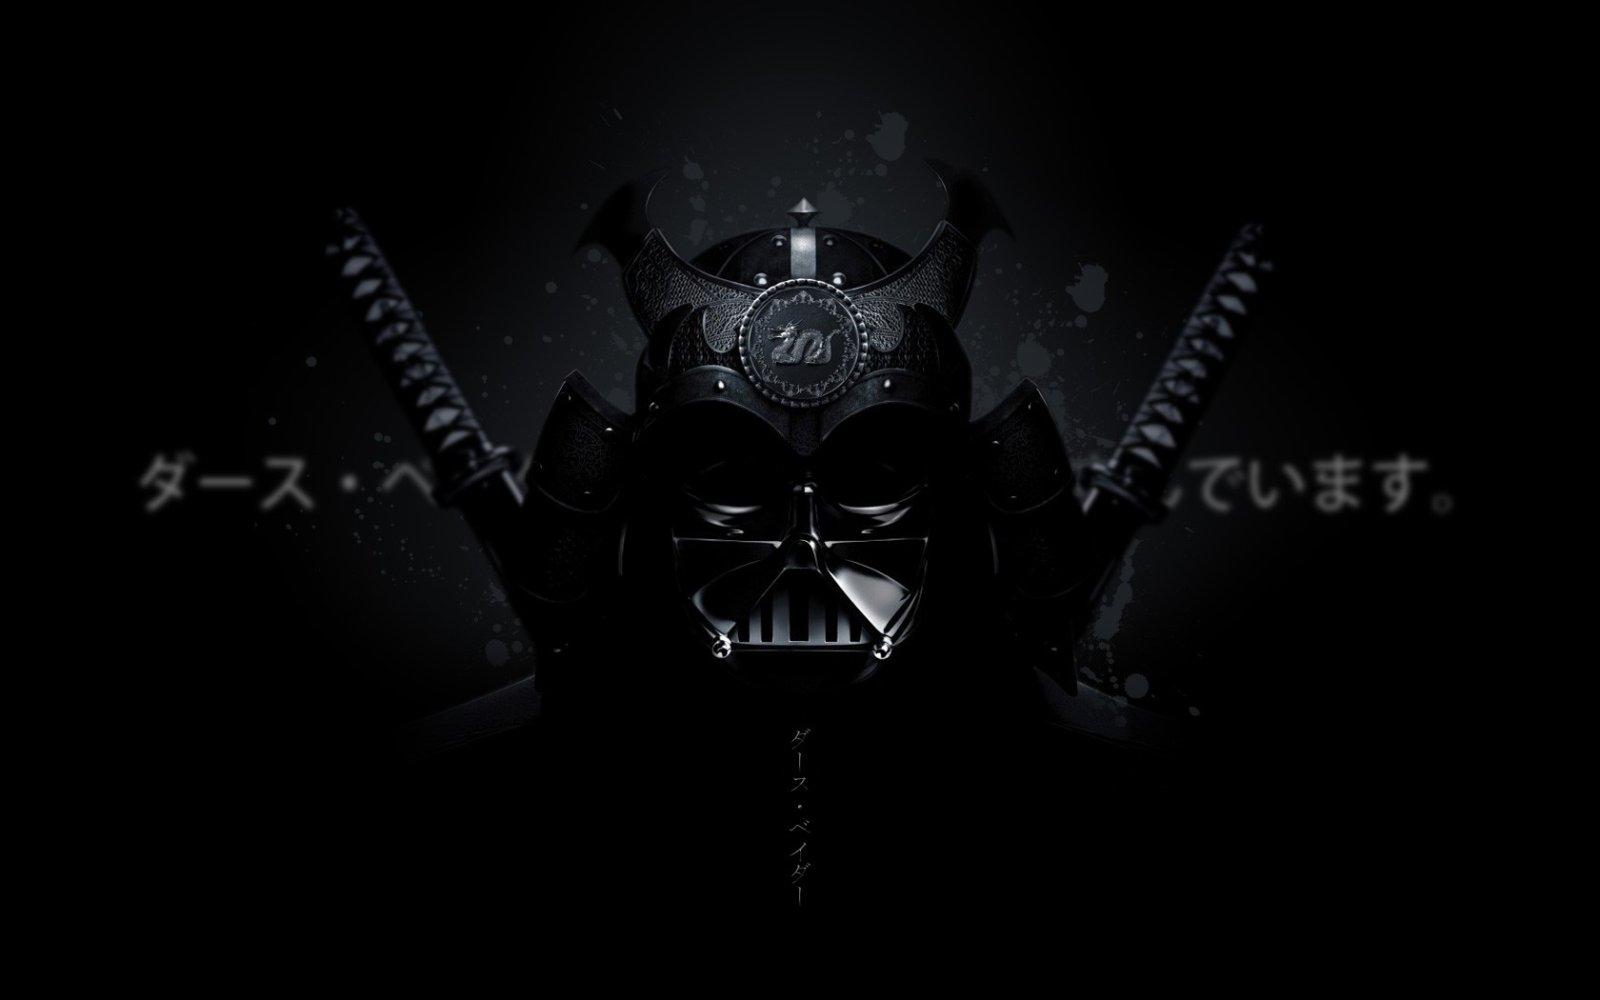 Darth-Vader-Samurai-x-wallpaper-wp5205656